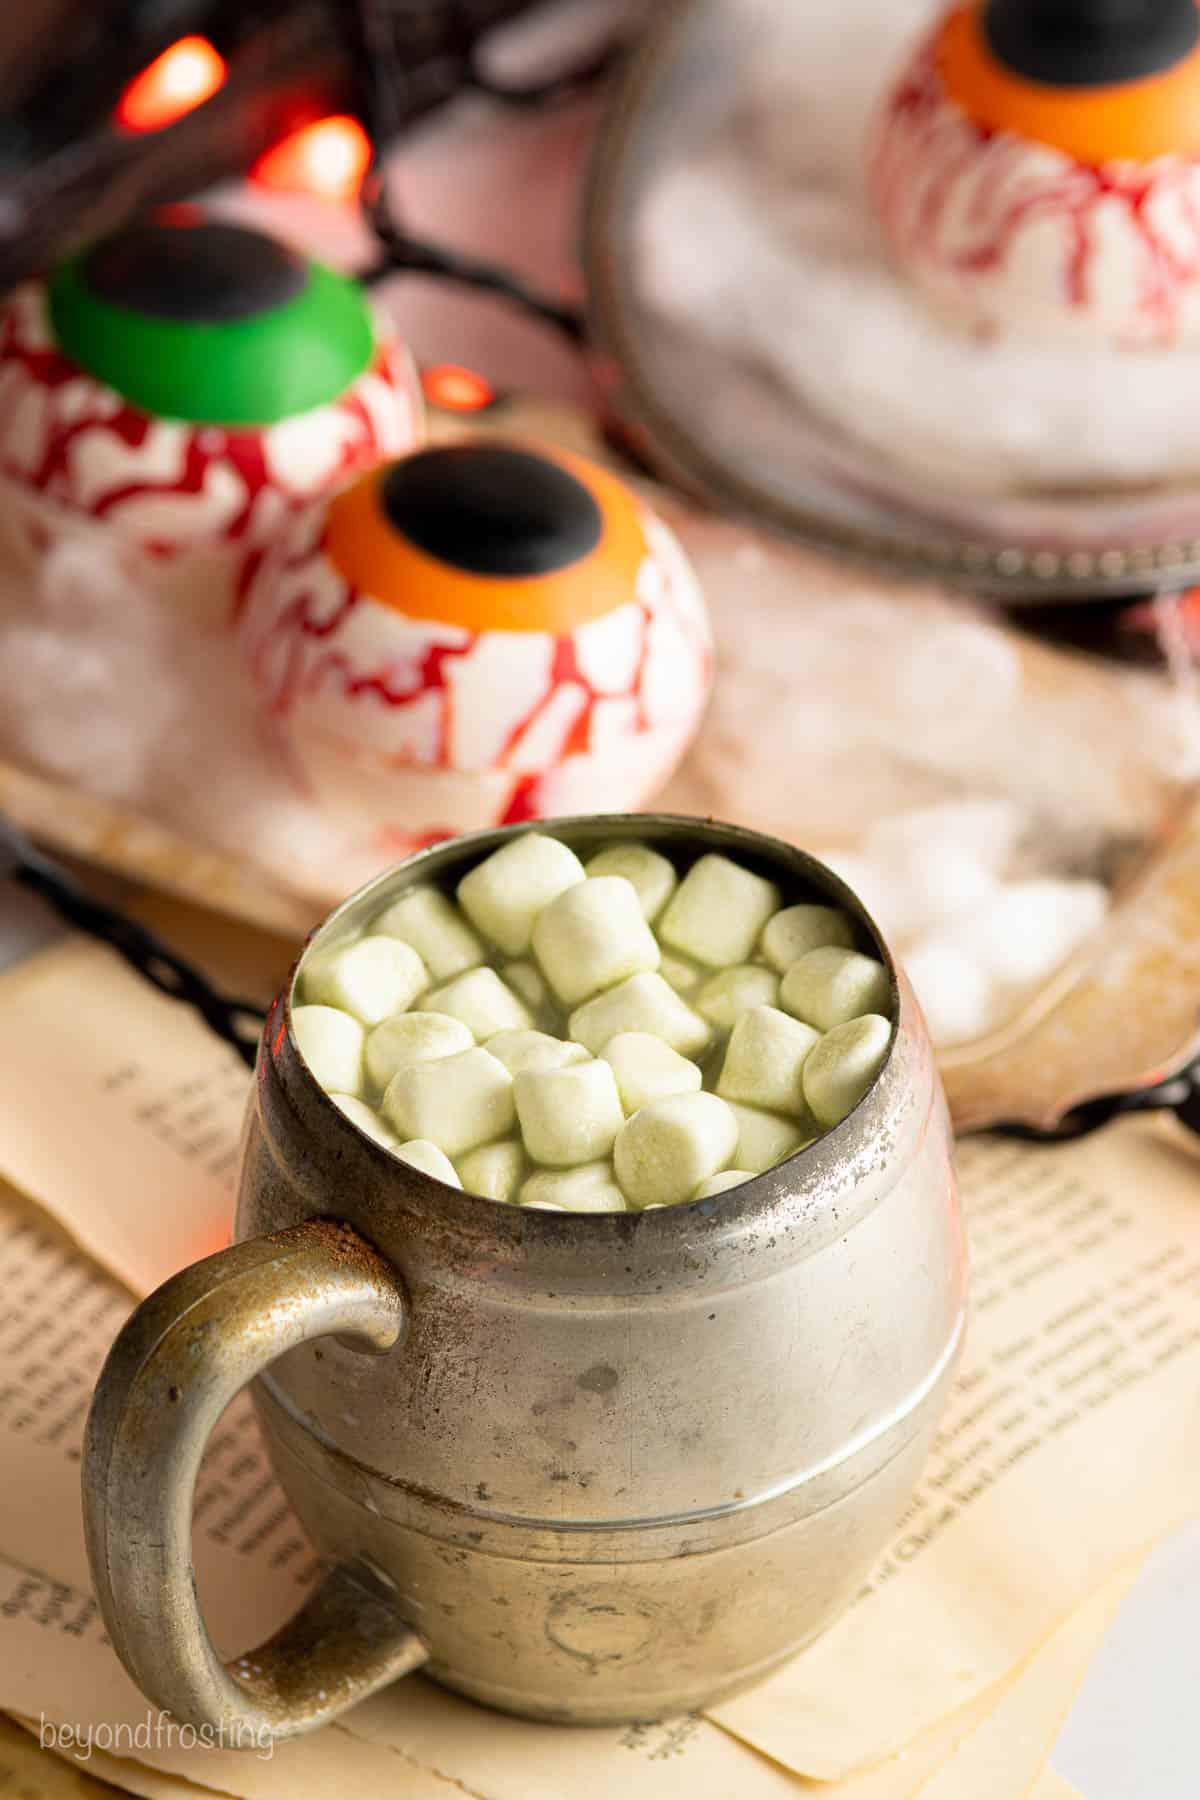 a vintage metal mug with hot chocolate and mini marshmallows